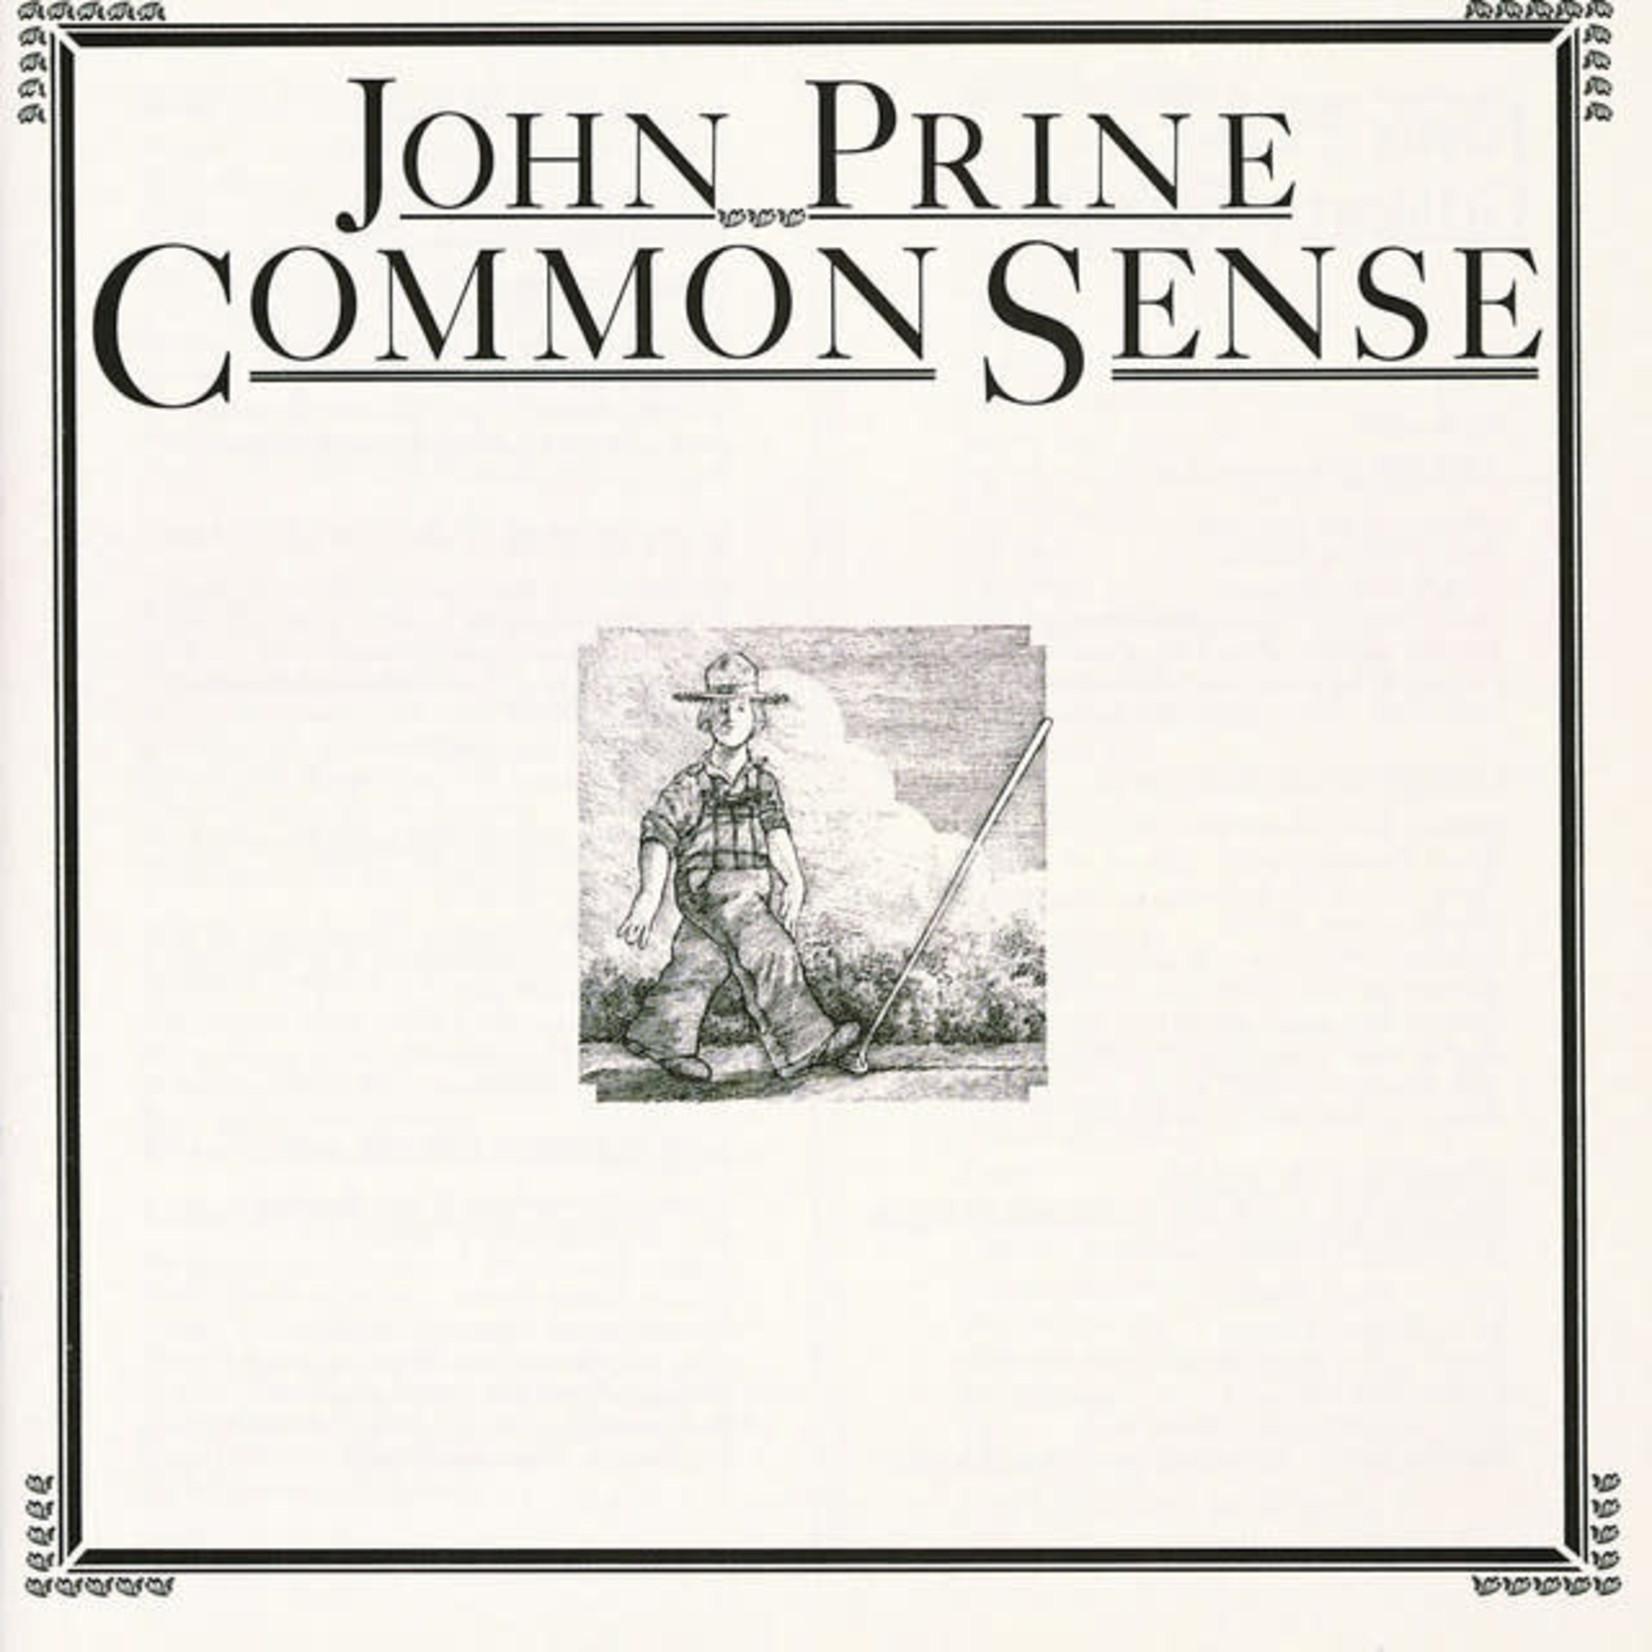 Vinyl John Prine - Common Sense